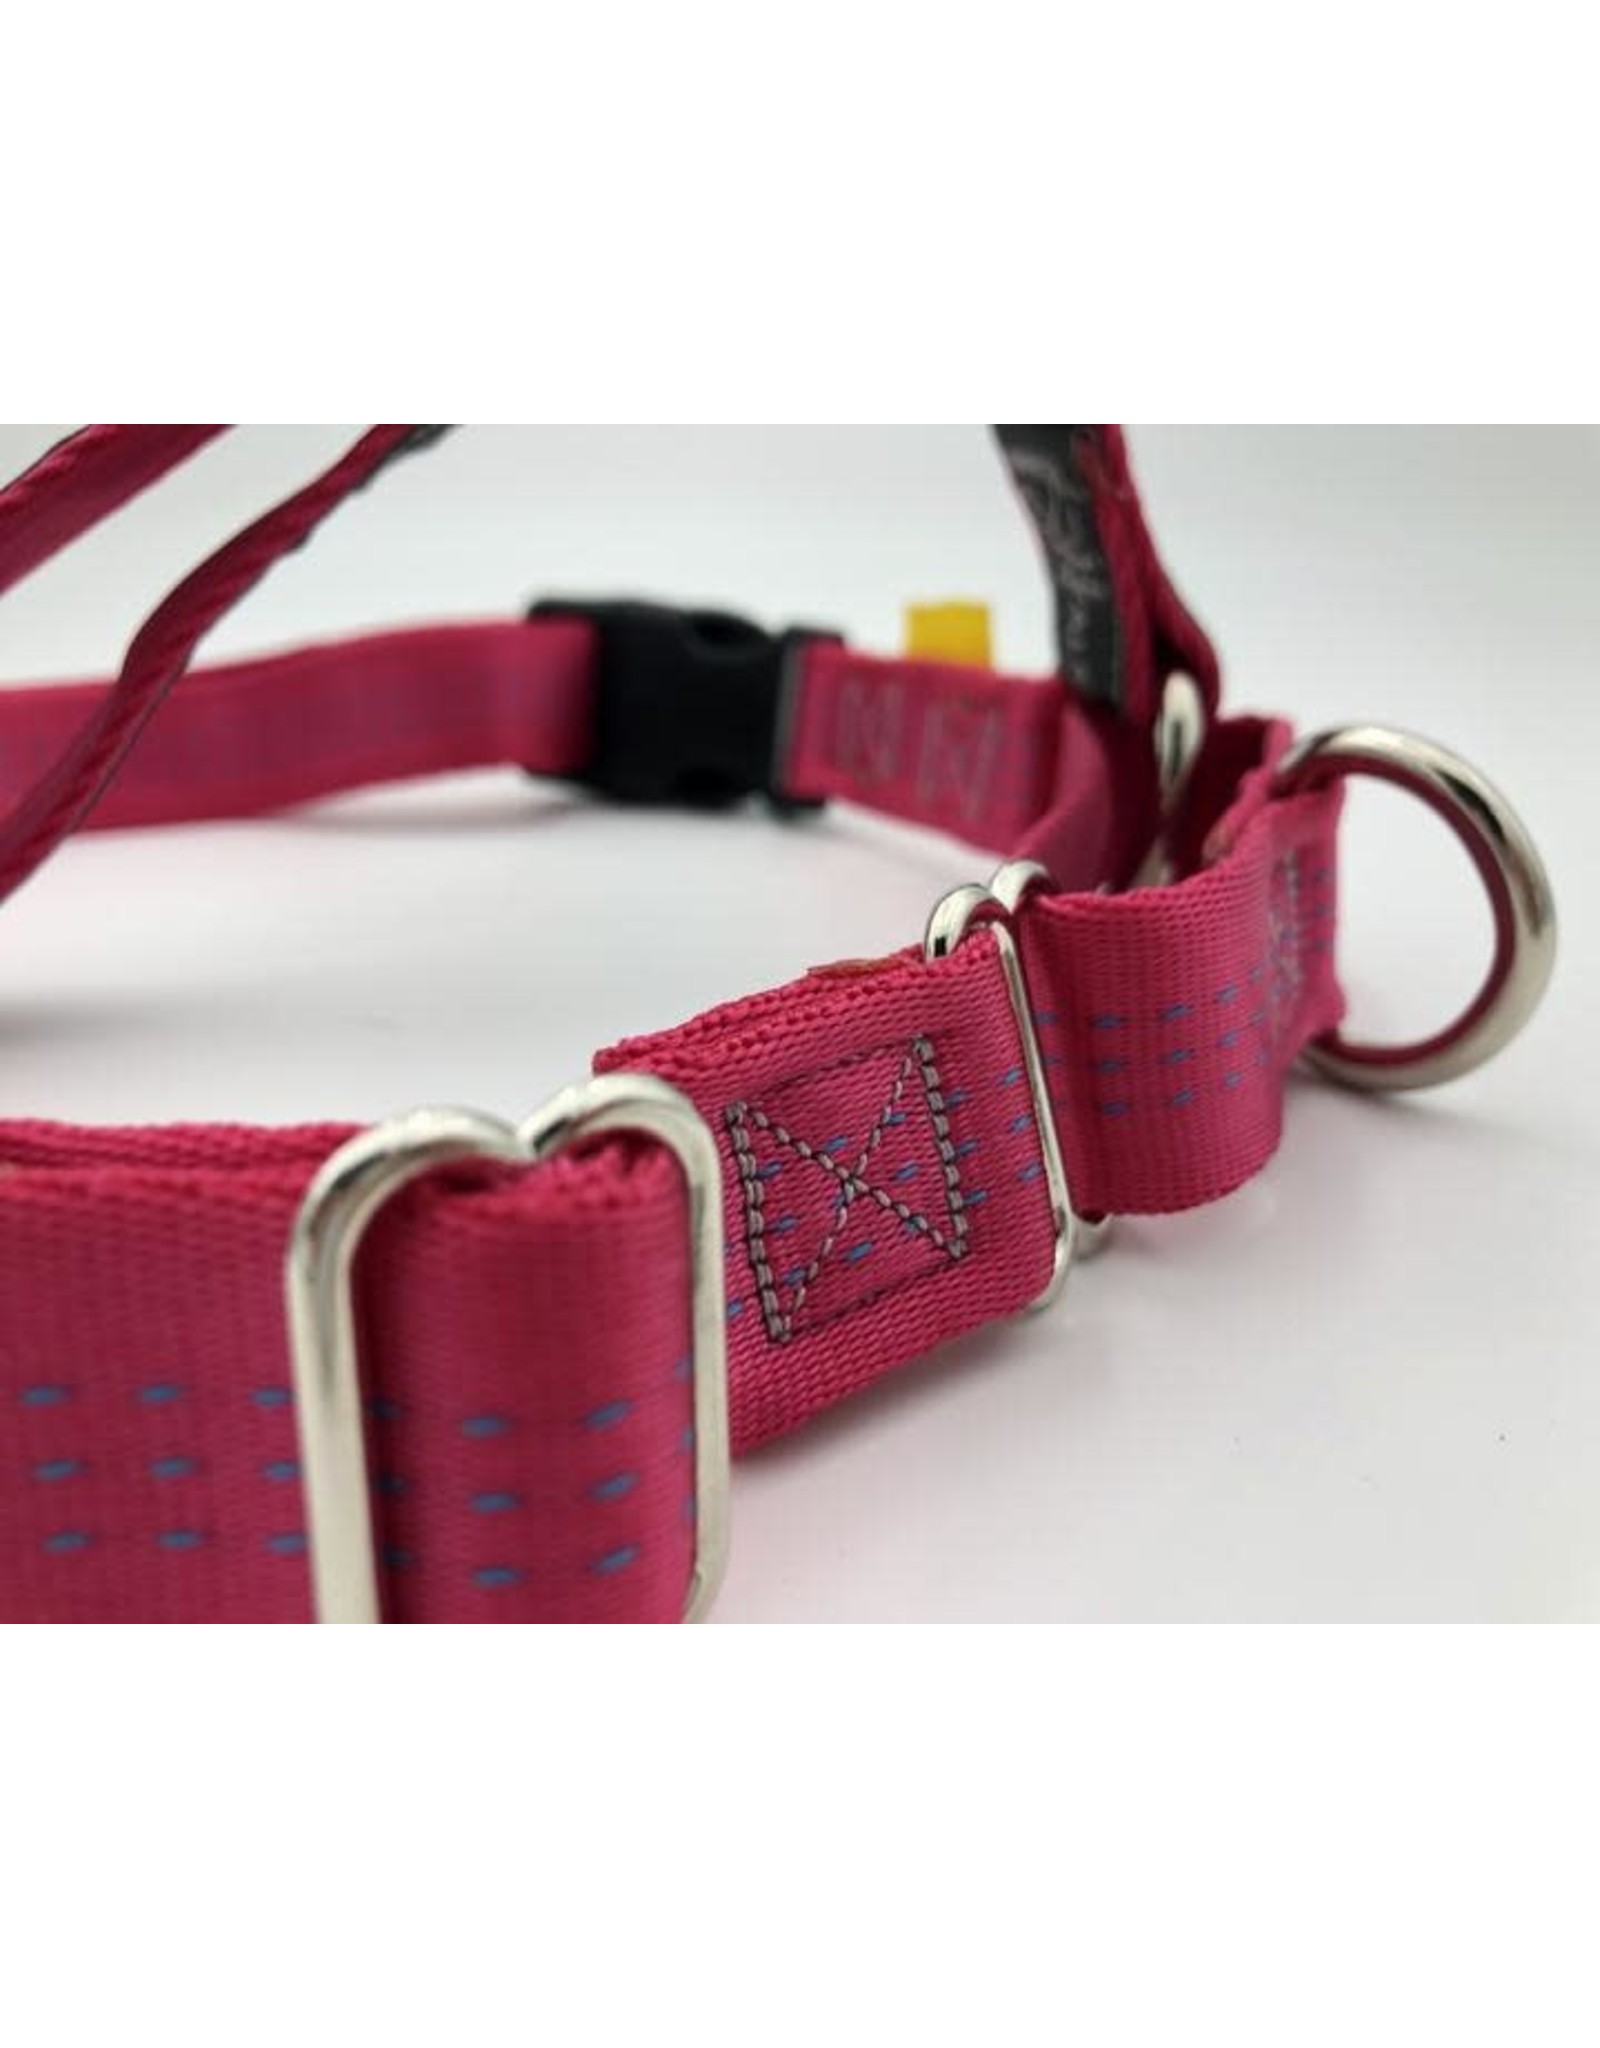 JWalker JWalker Harness - Pink - M/L